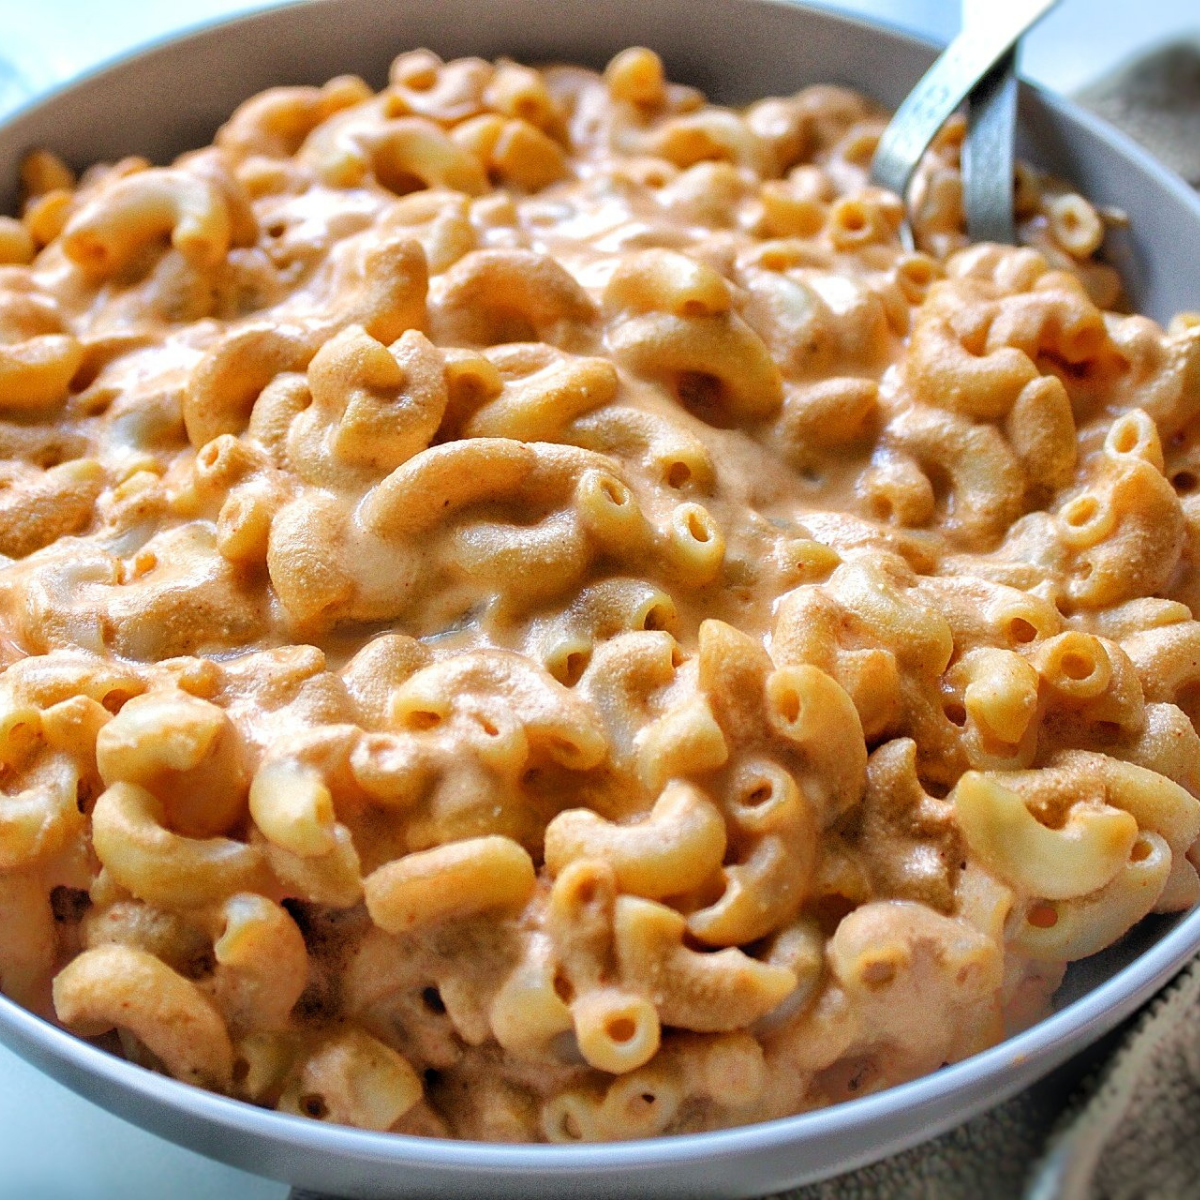 Bowl of vegan macaroni and cheese.